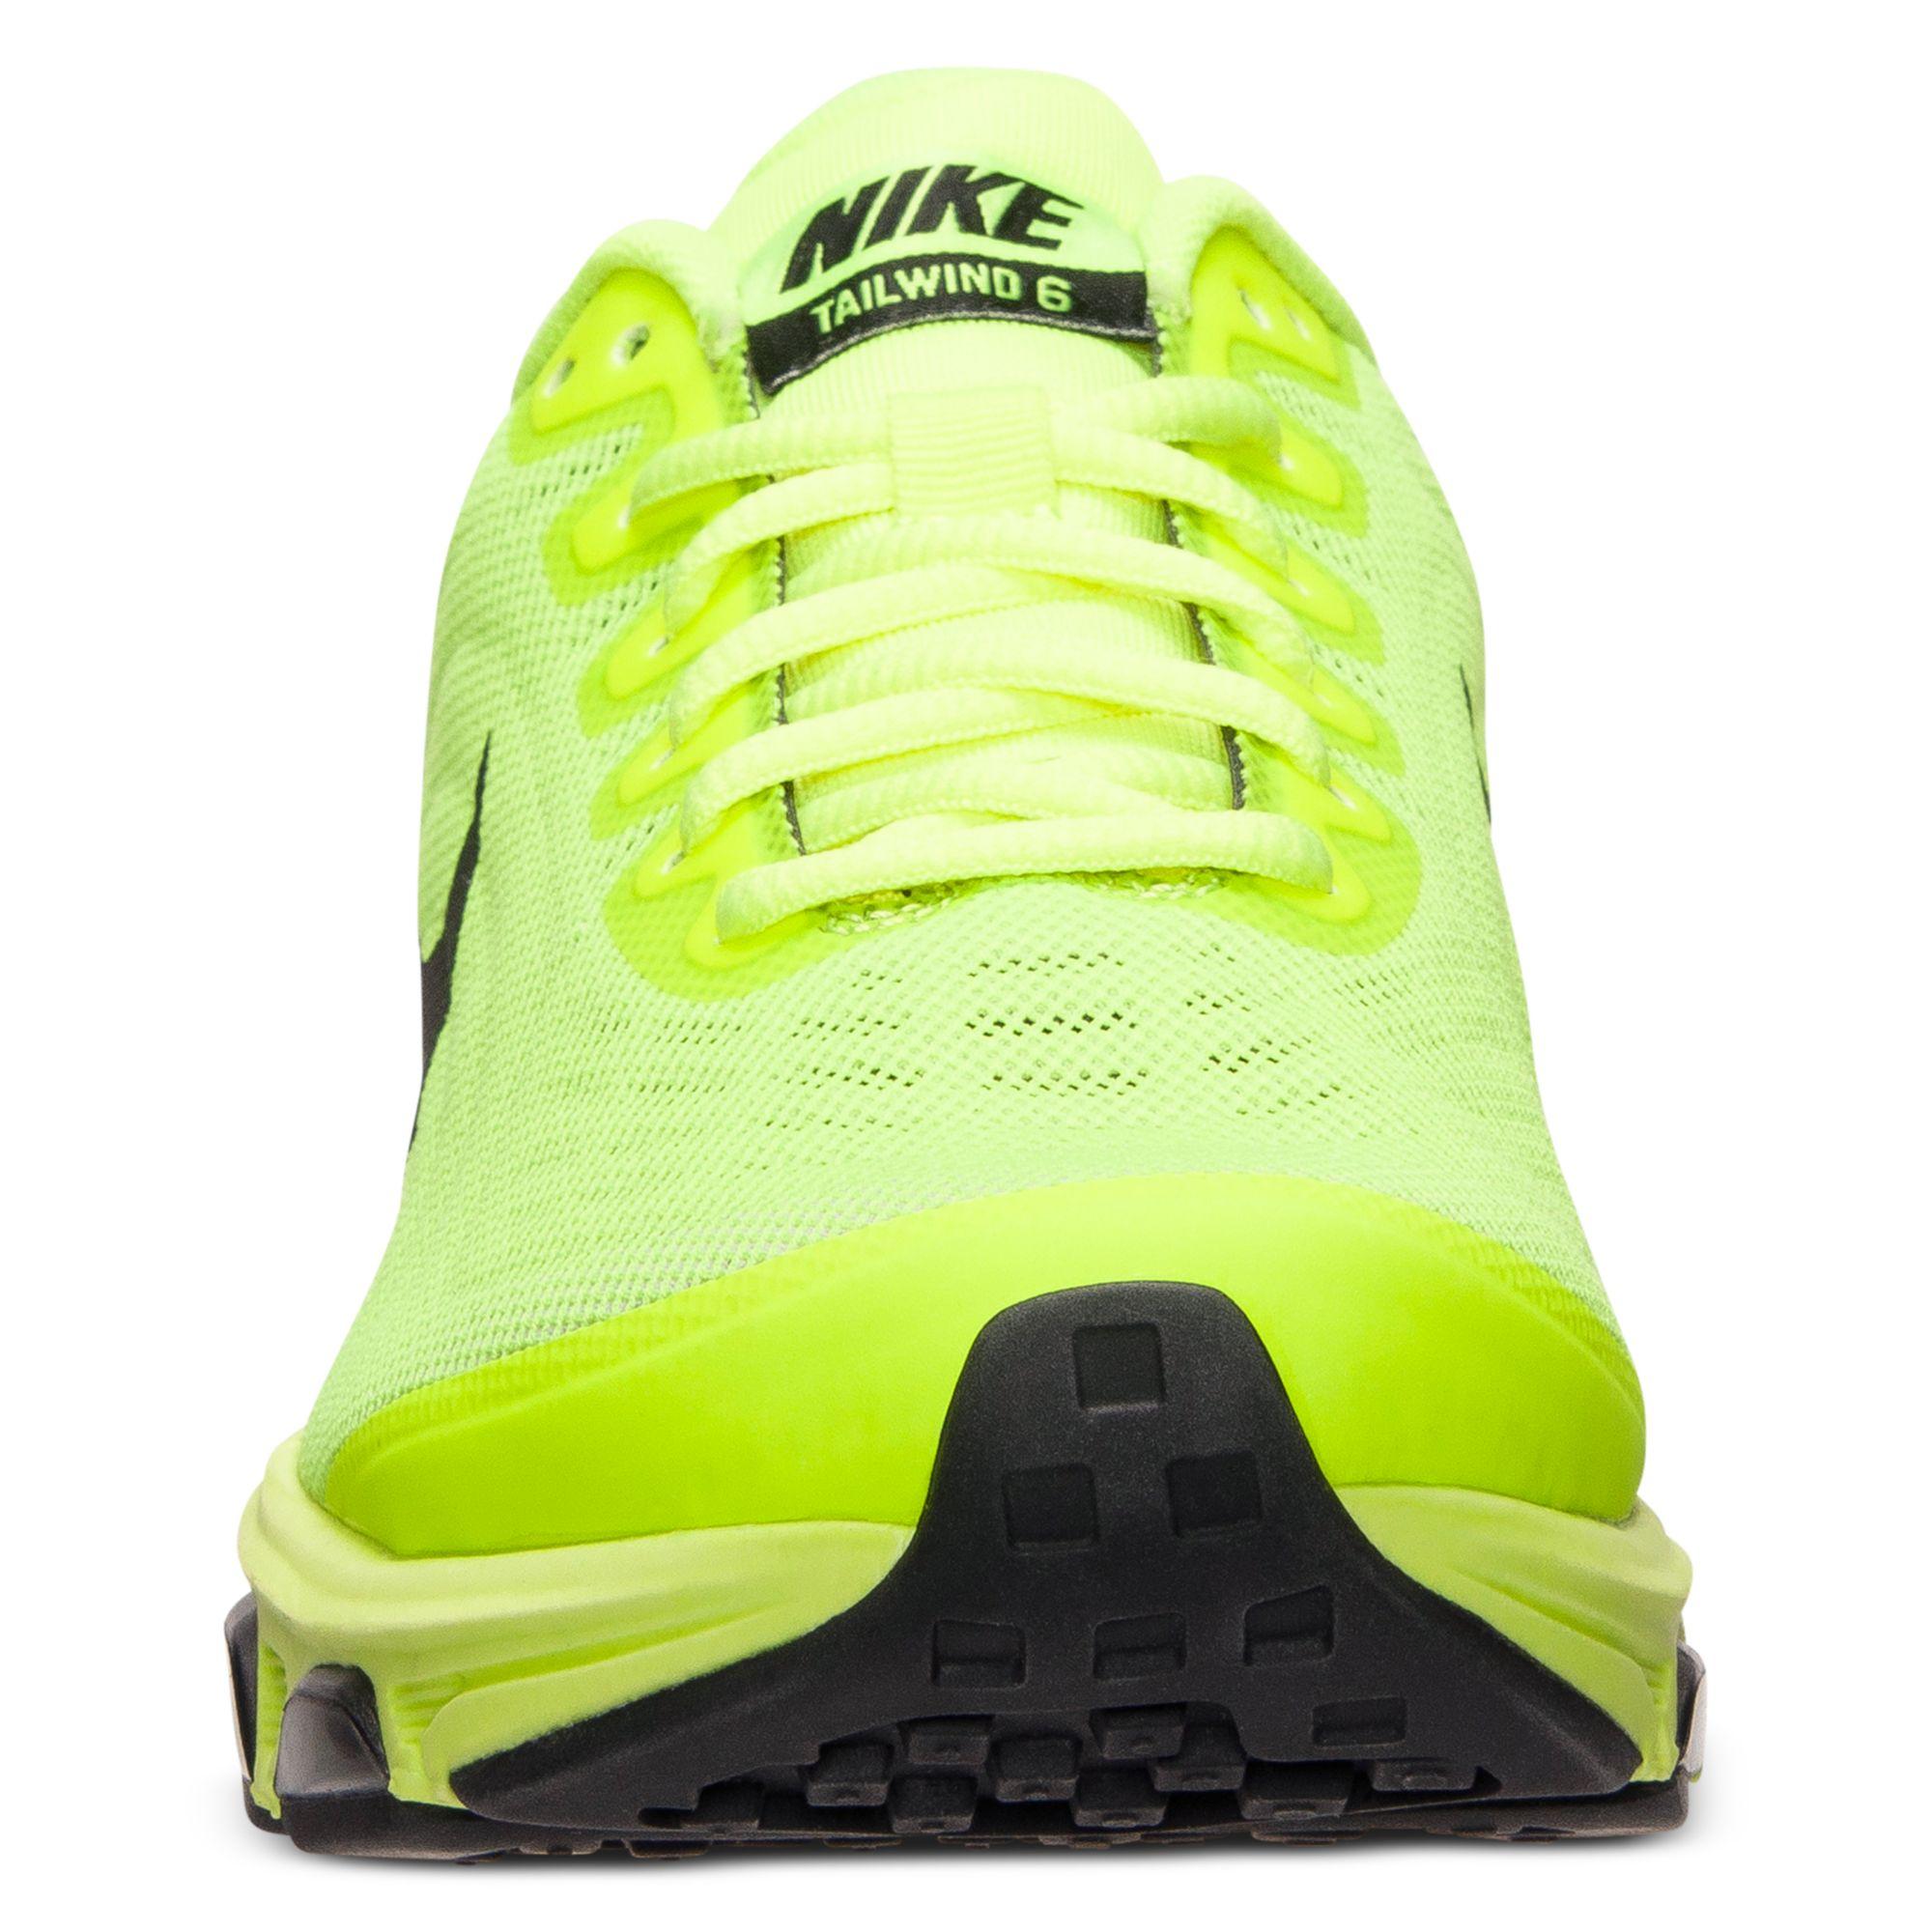 db4757a539b475 ... best lyst nike mens air max tailwind 6 running sneakers from finish  65f2b 2d391